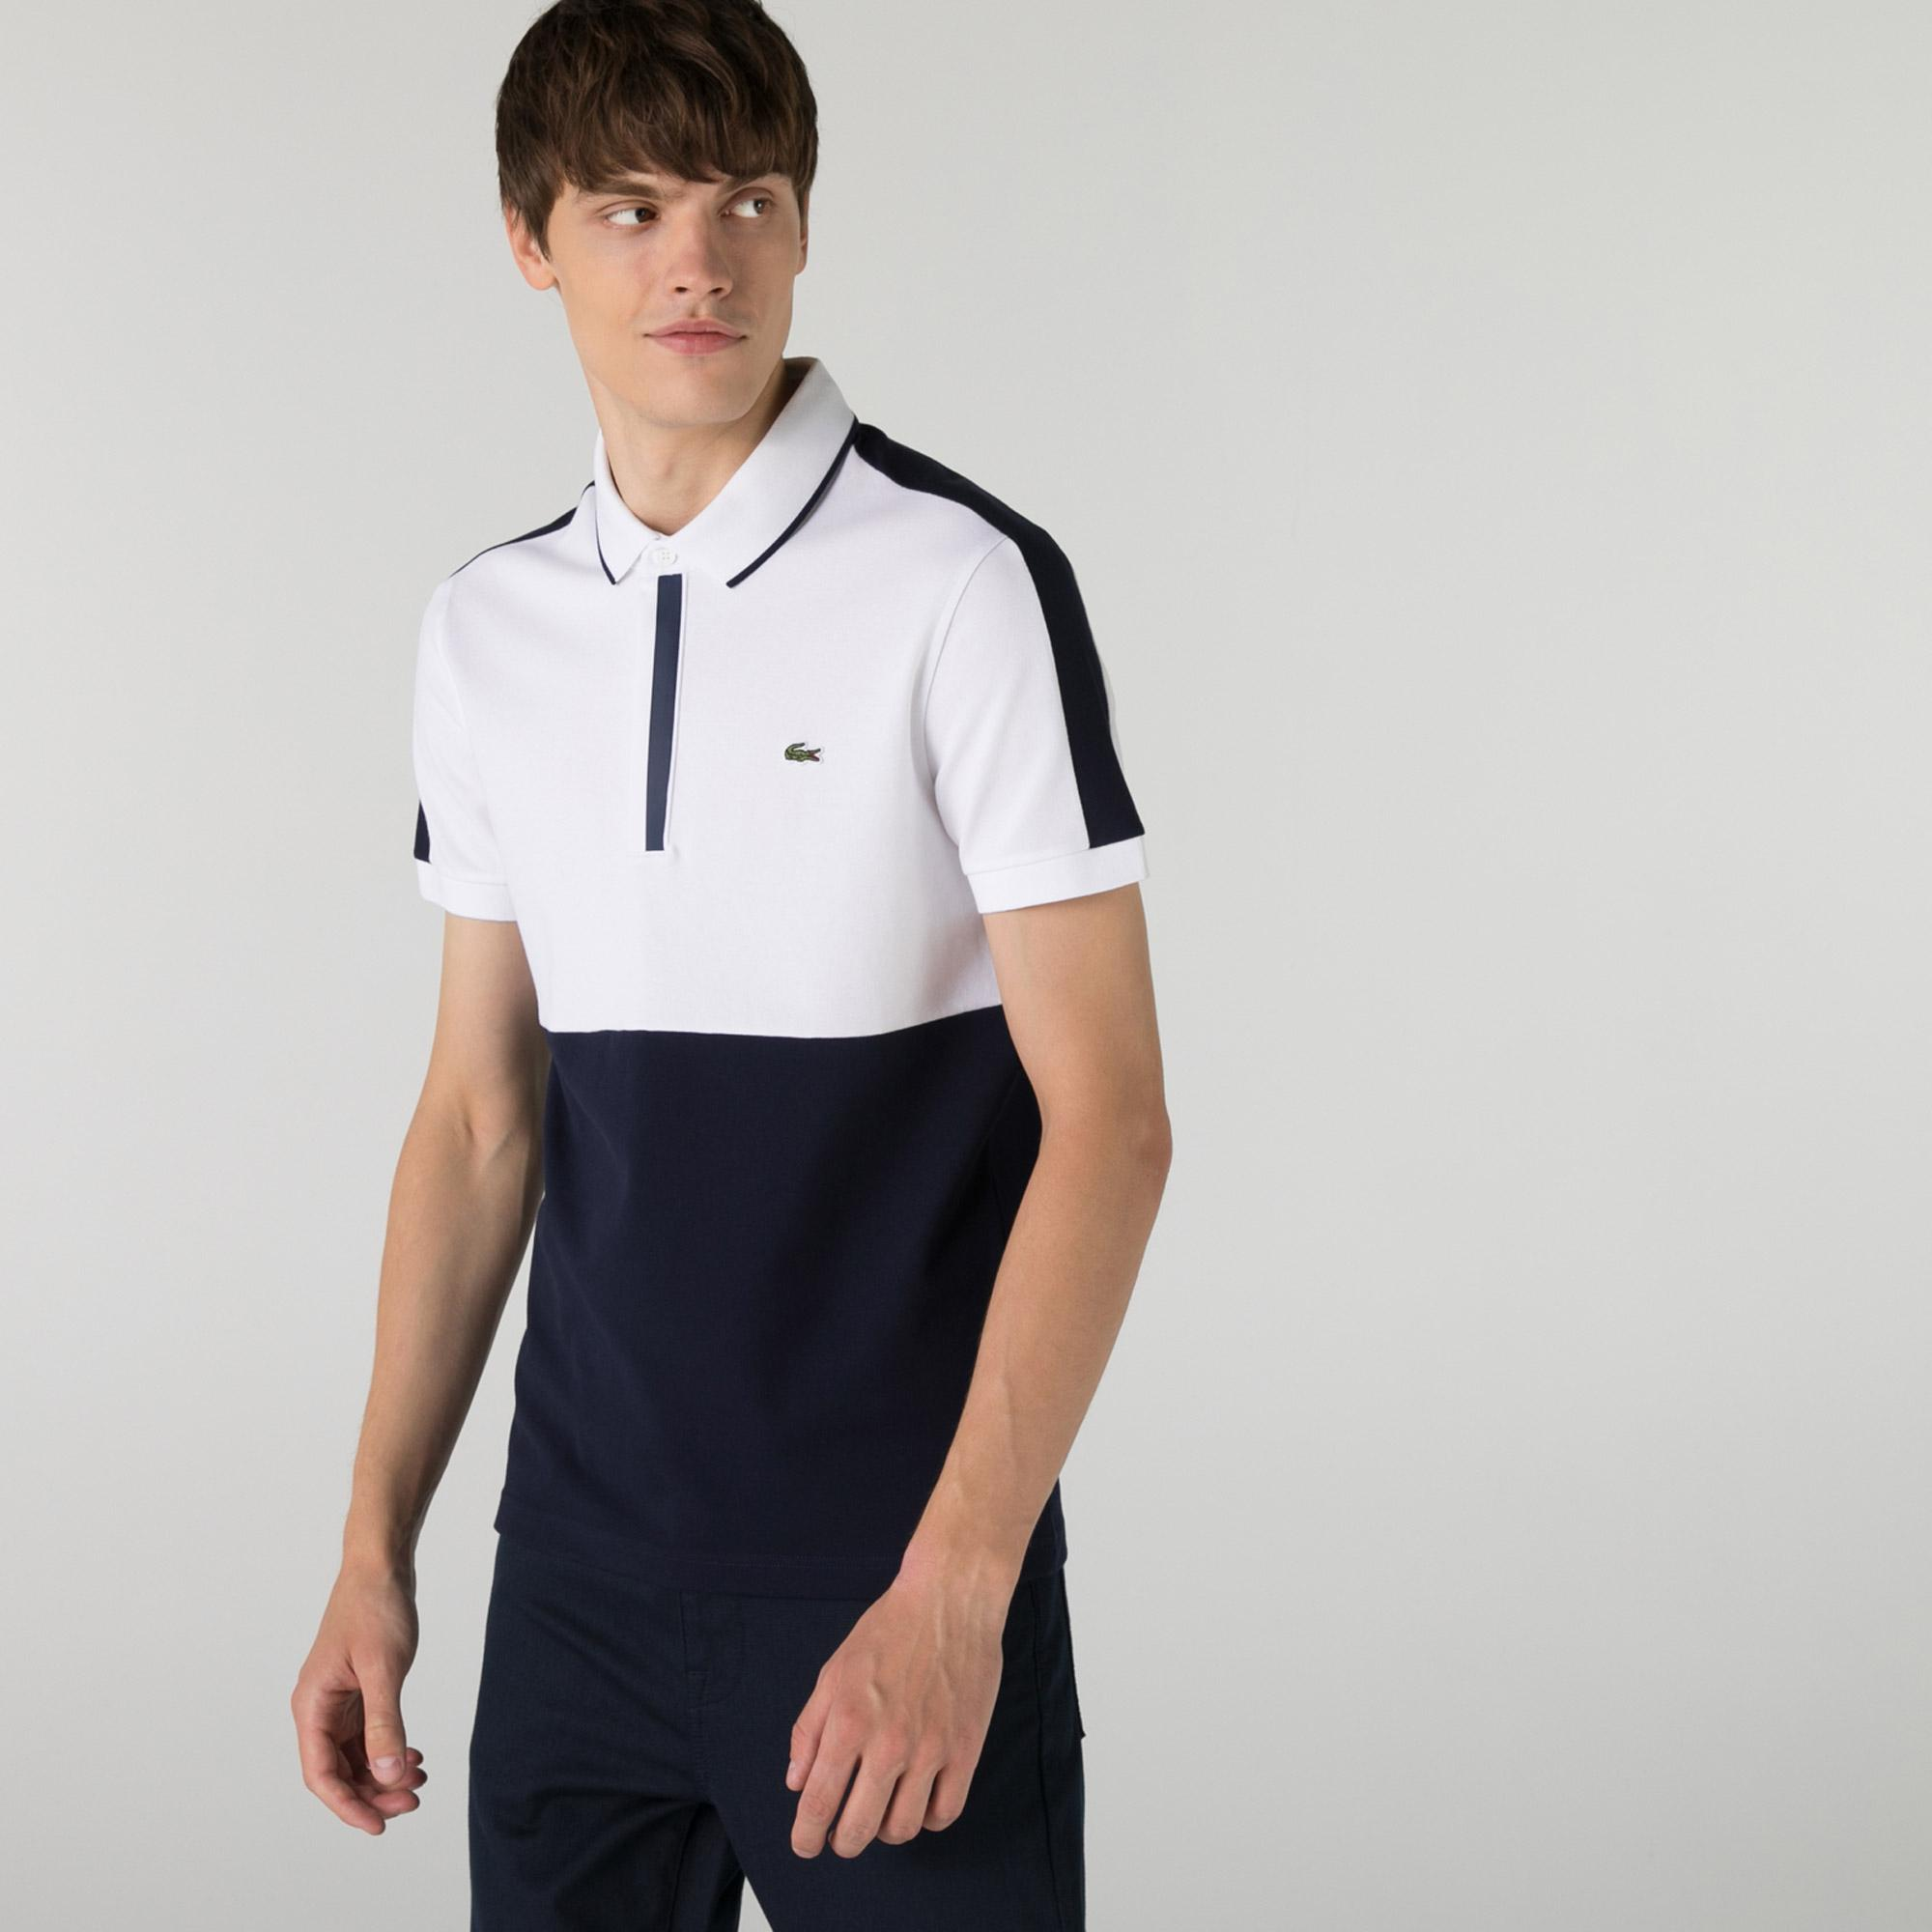 Lacoste Erkek Regular Fit Renk Bloklu Beyaz Polo